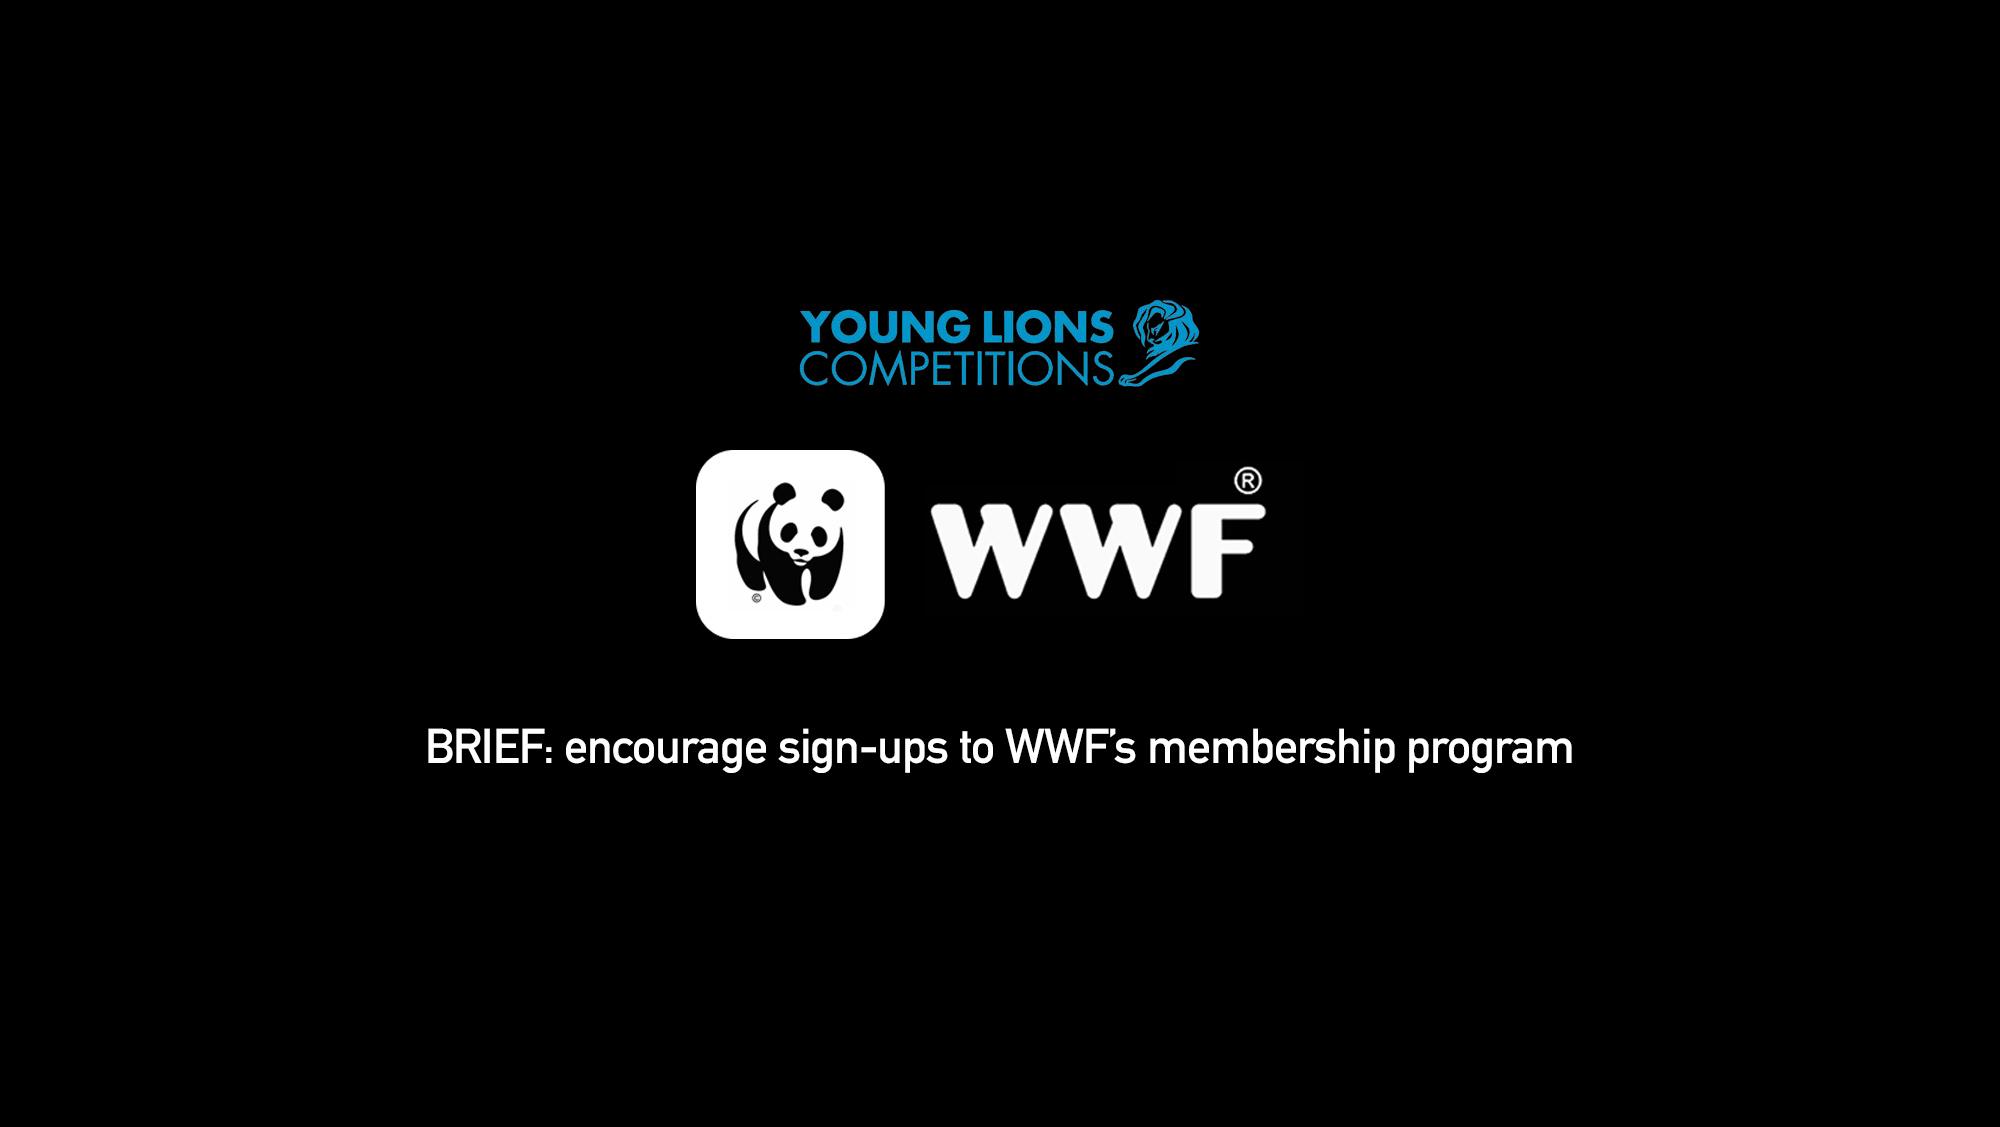 YLbrief_WWF.jpg